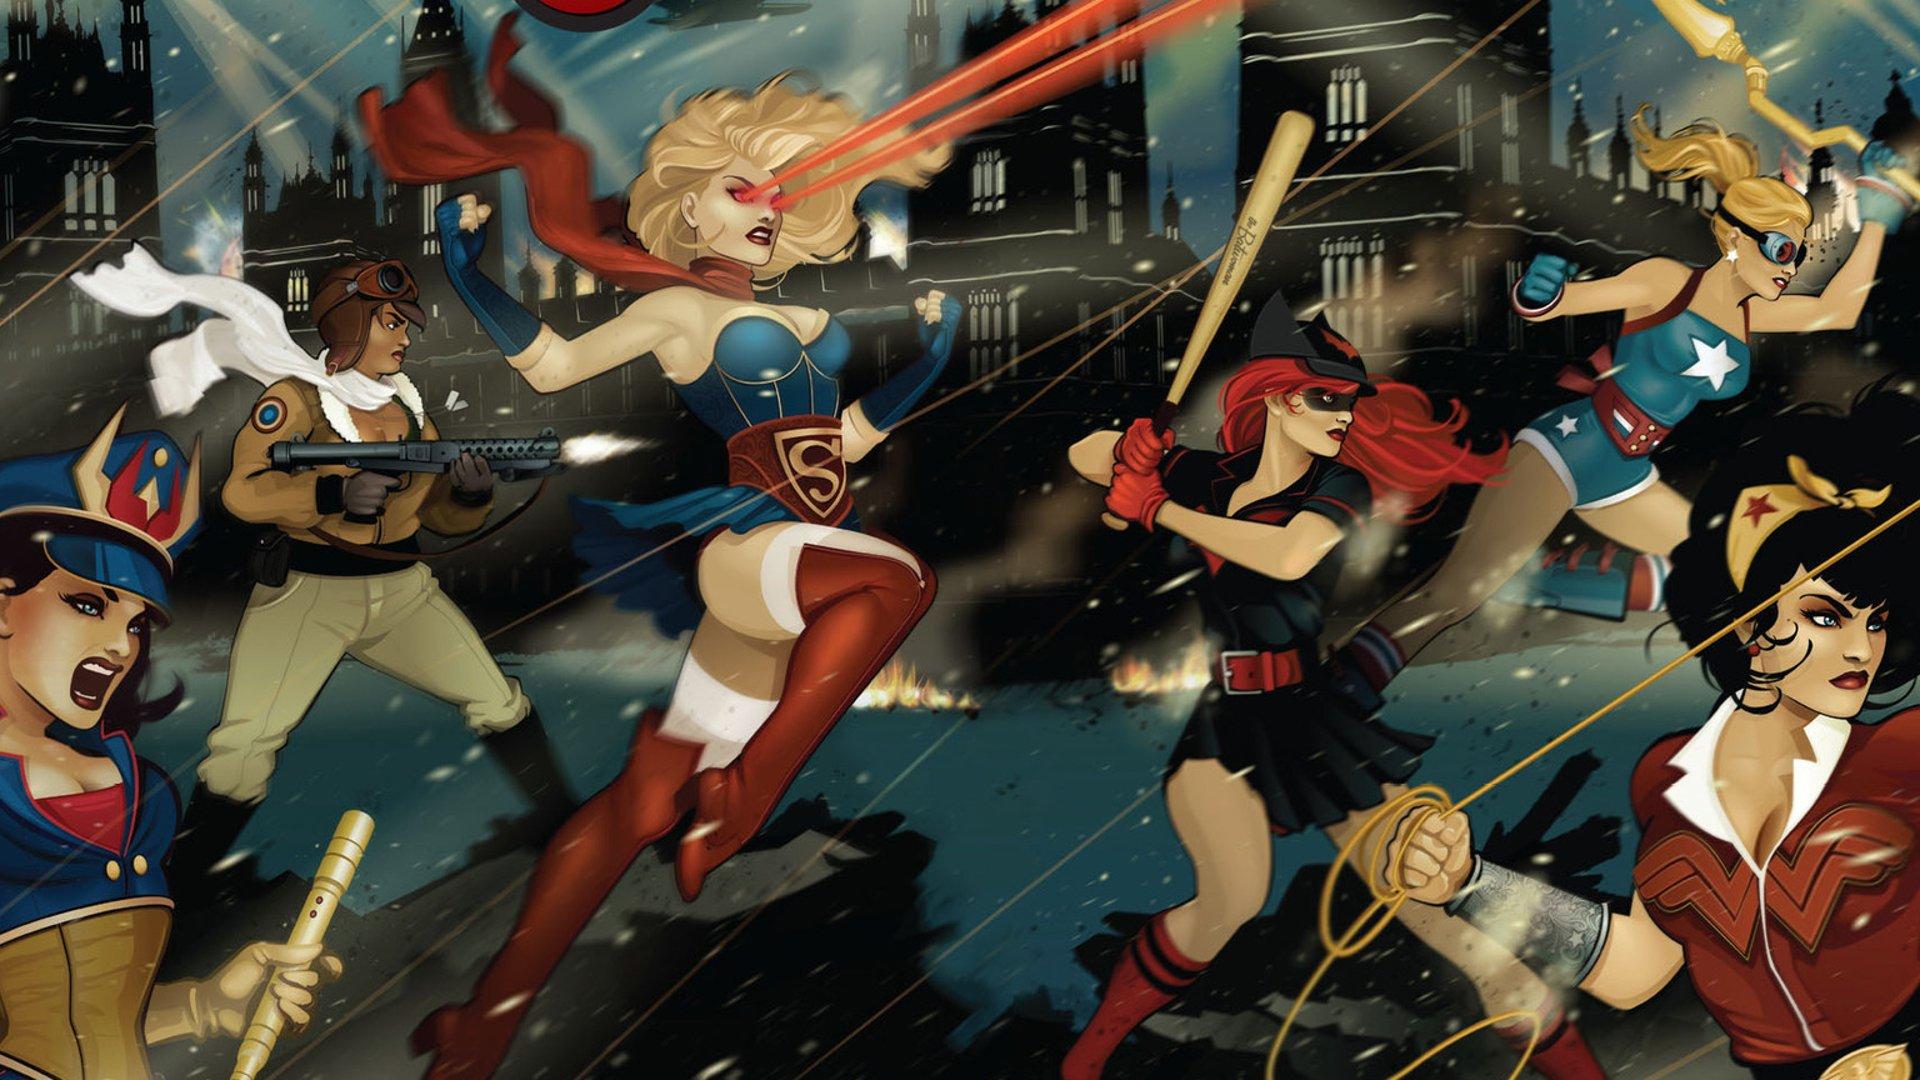 Bombshell girls head into battle